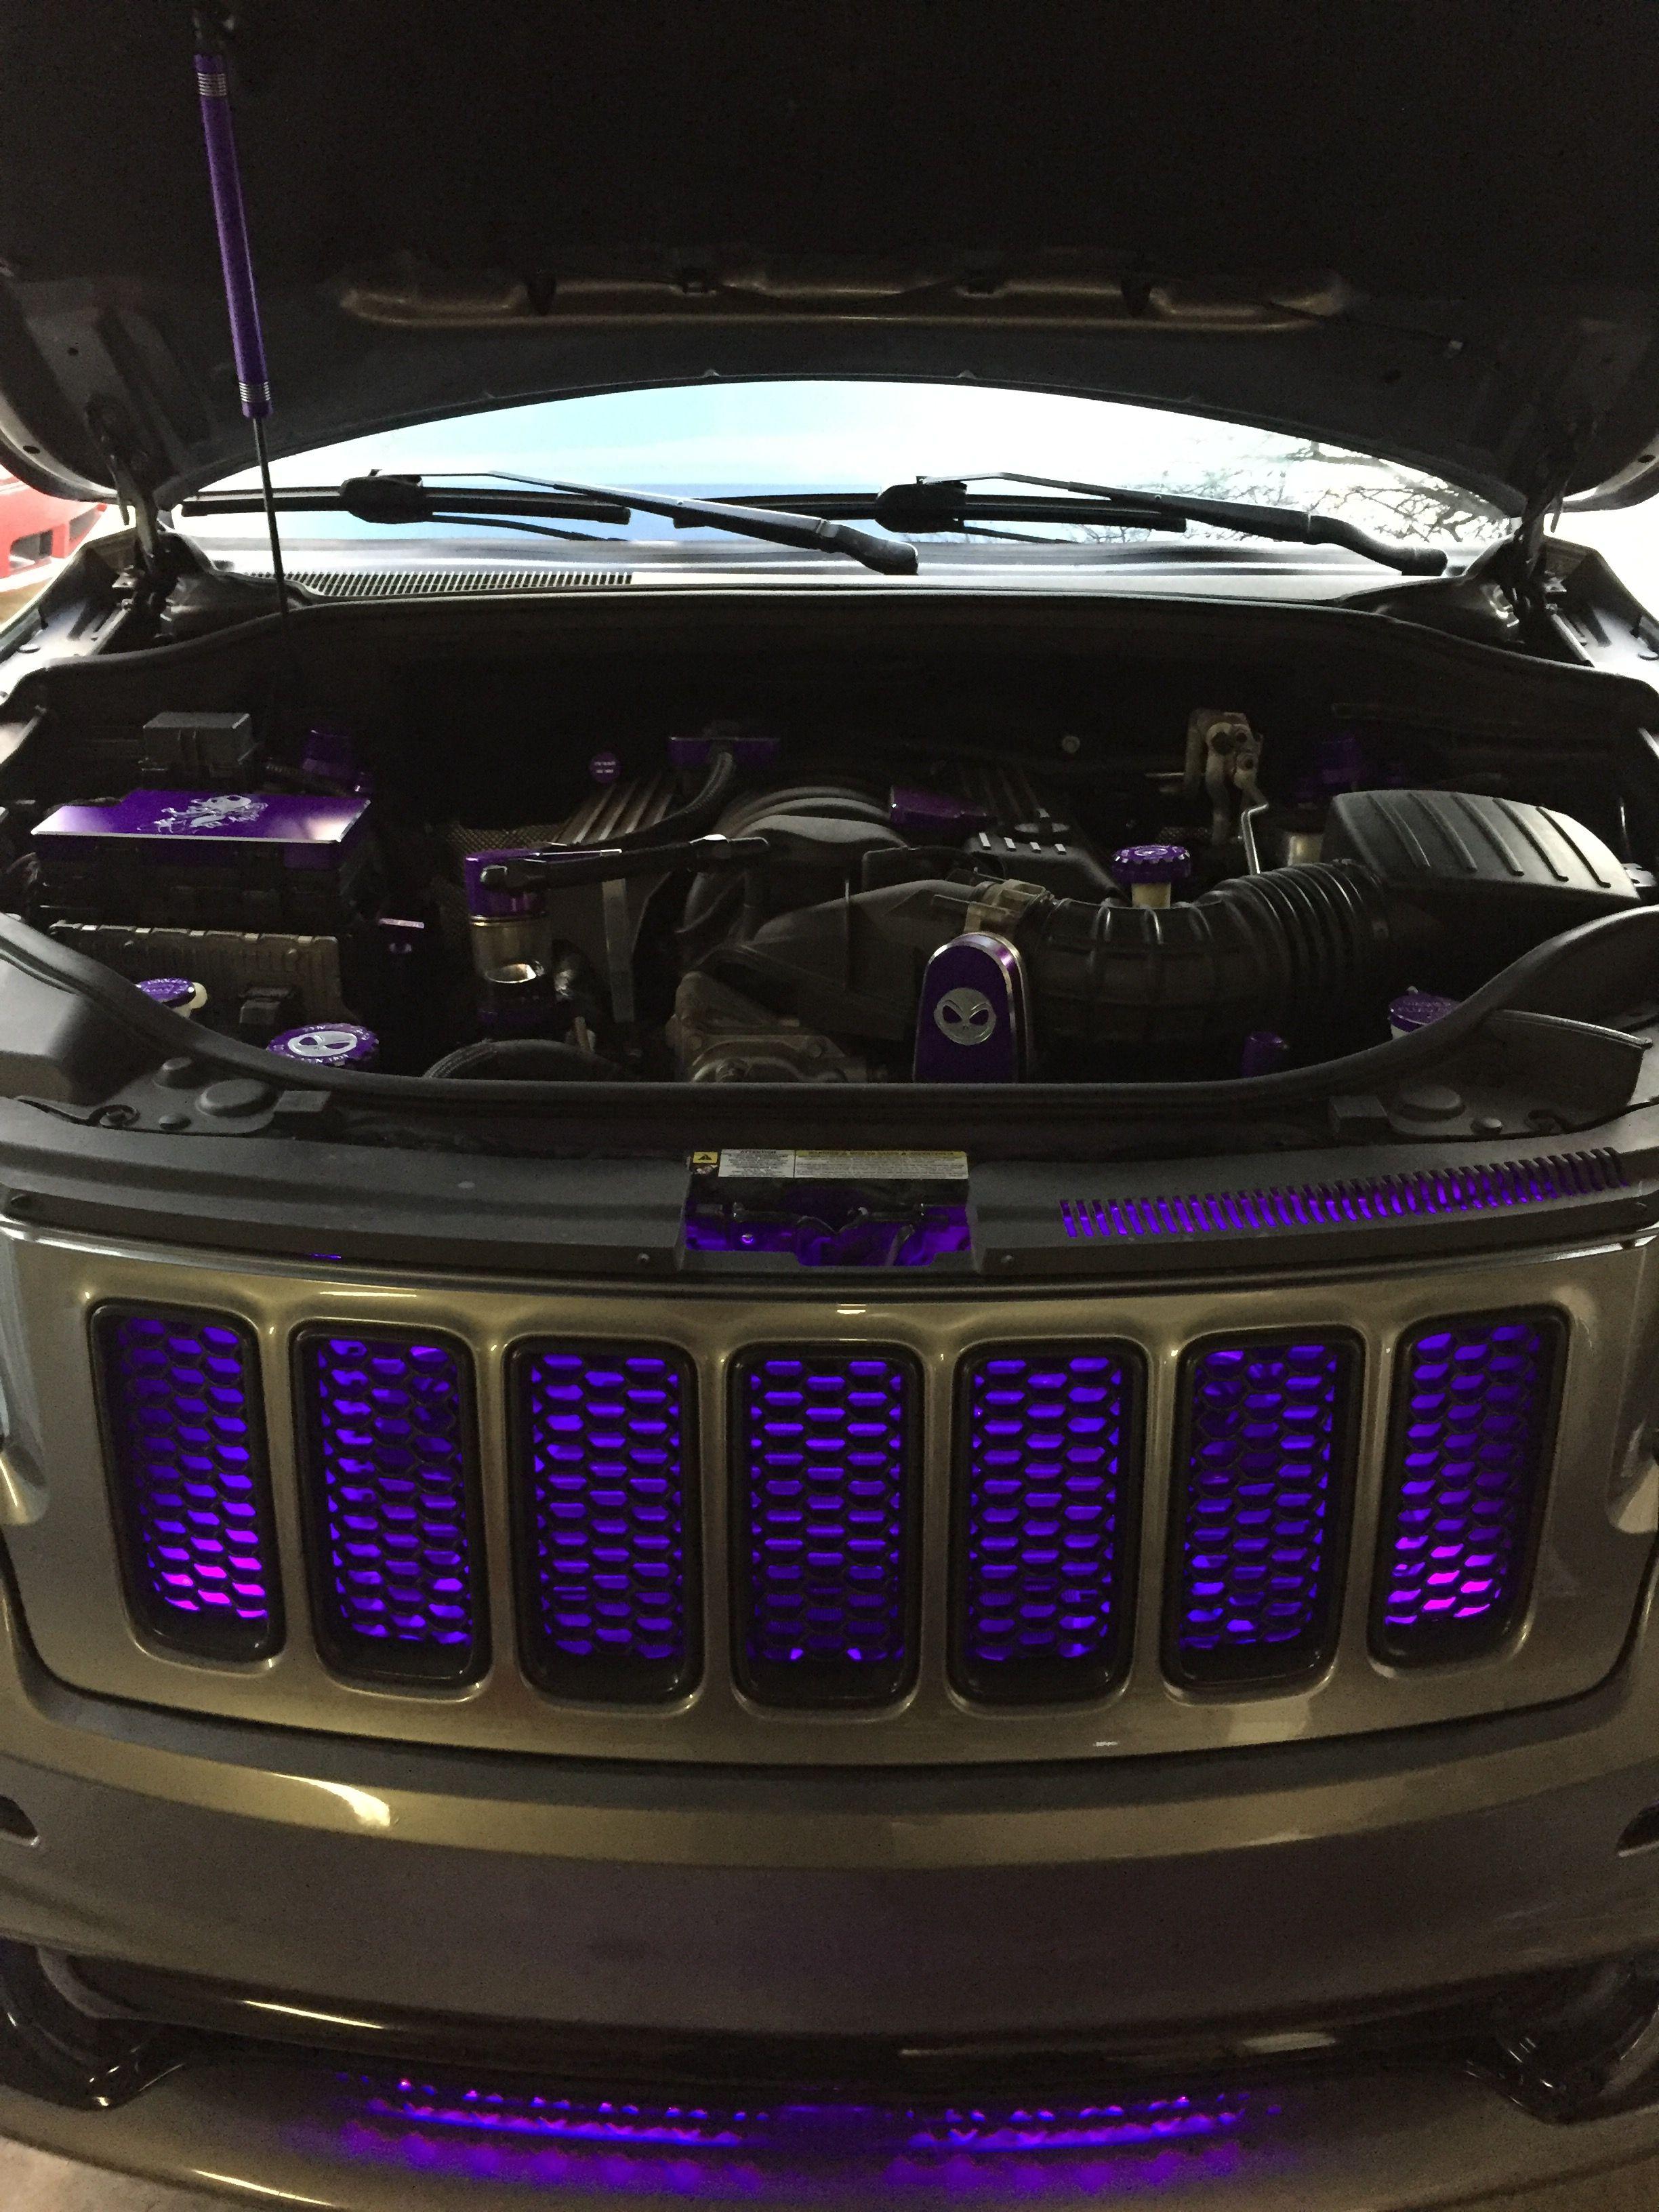 2012 jeep grand cherokee srt8 graphite with purple grill lights and purple billet technology under hood trim kit  [ 2448 x 3264 Pixel ]